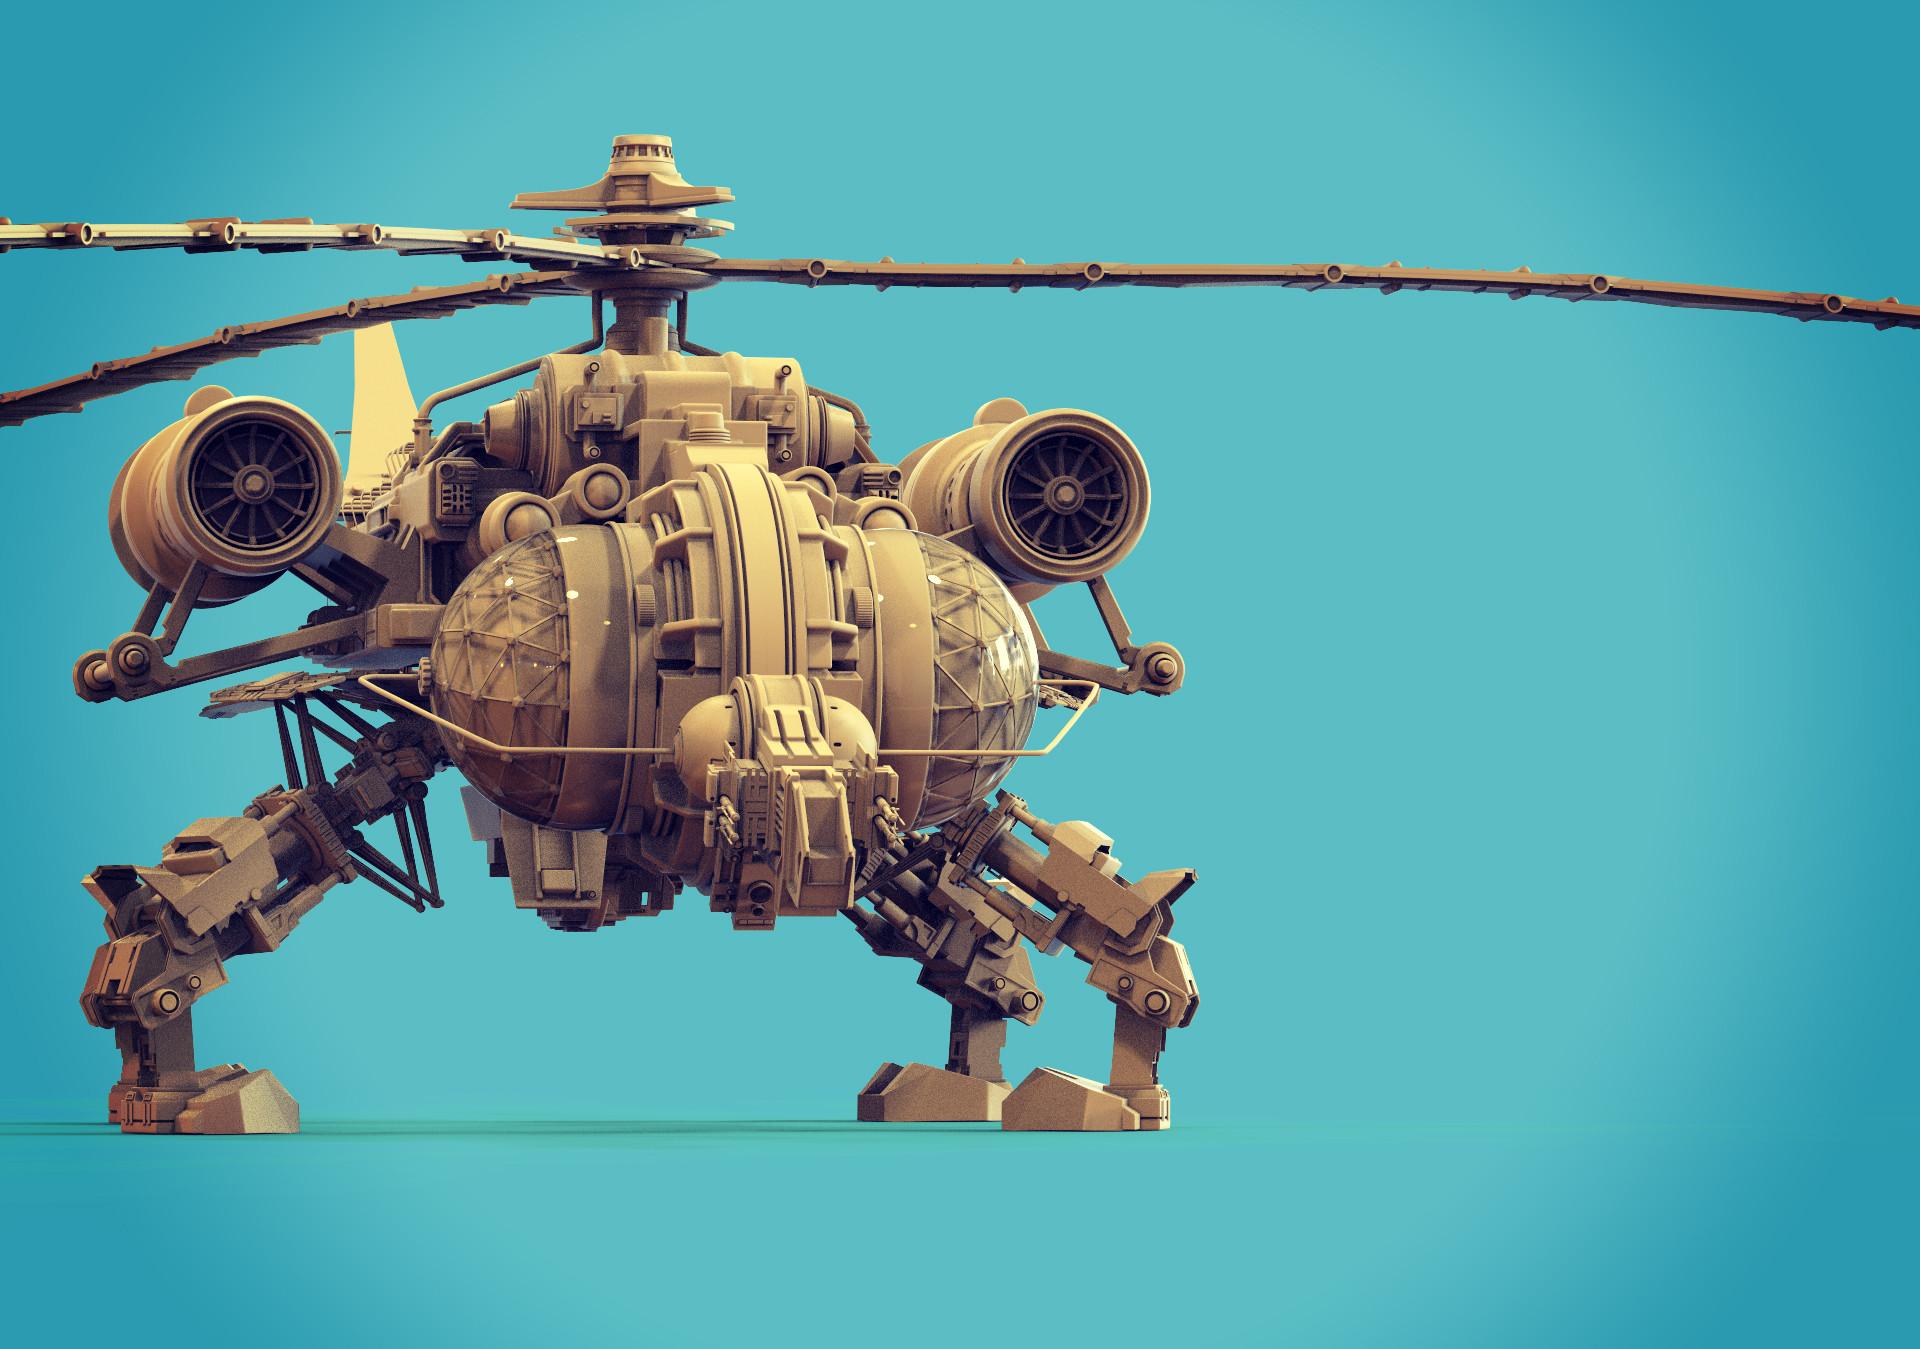 Ben nicholas bughelicopter 04